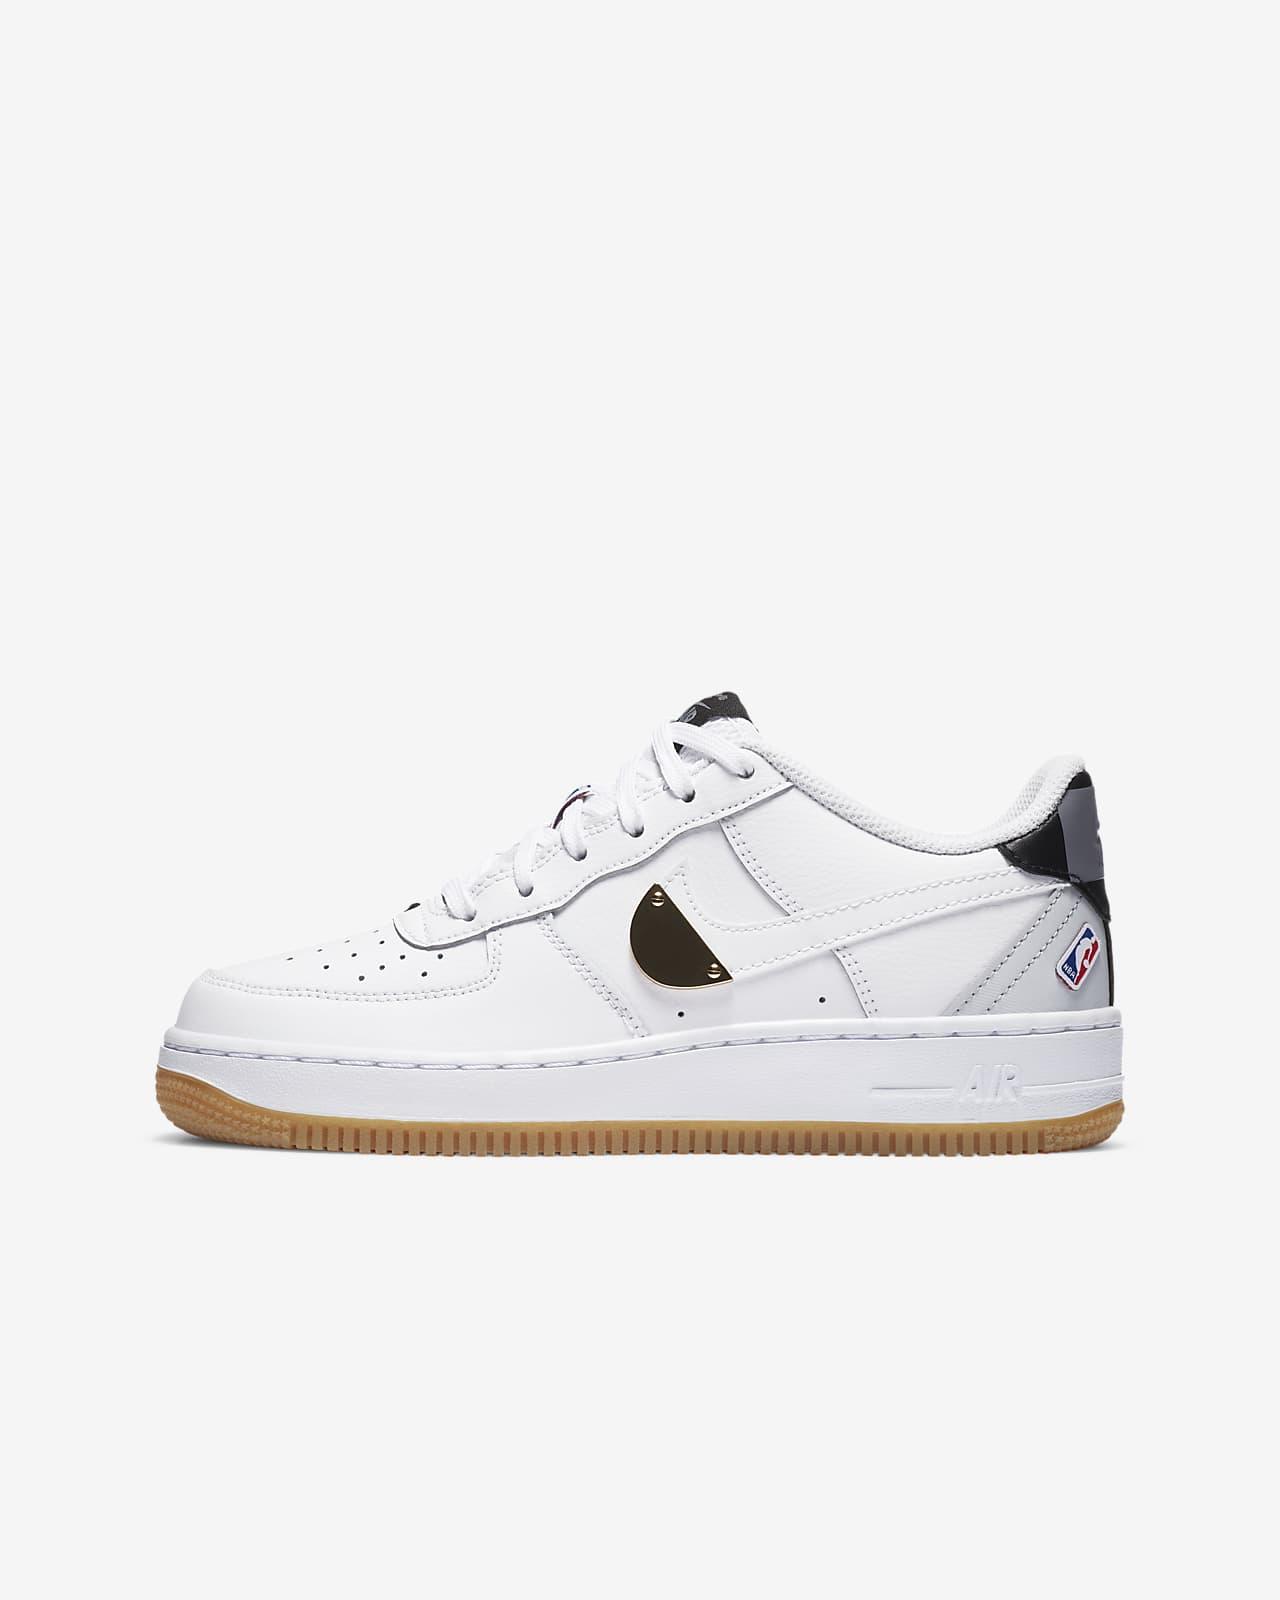 Nike Air Force 1 LV8 1 HO20 (GS) 大童运动童鞋